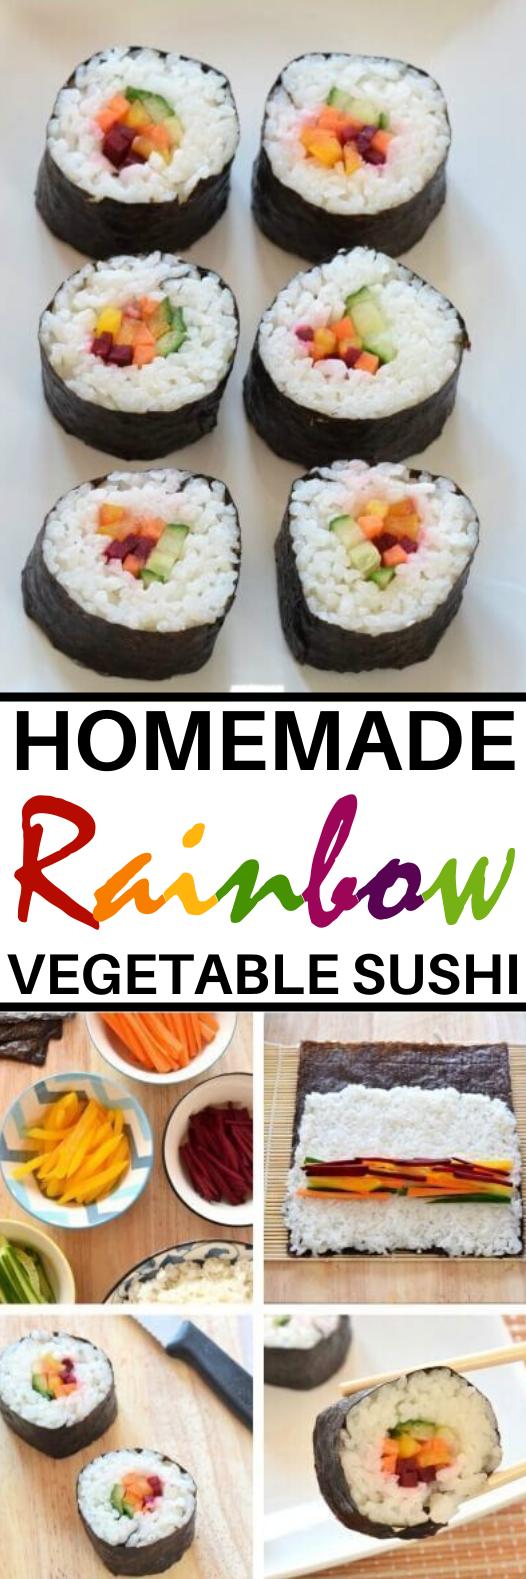 Rainbow Vegetable Sushi #vegan #recipes #dinner #easy #healthy